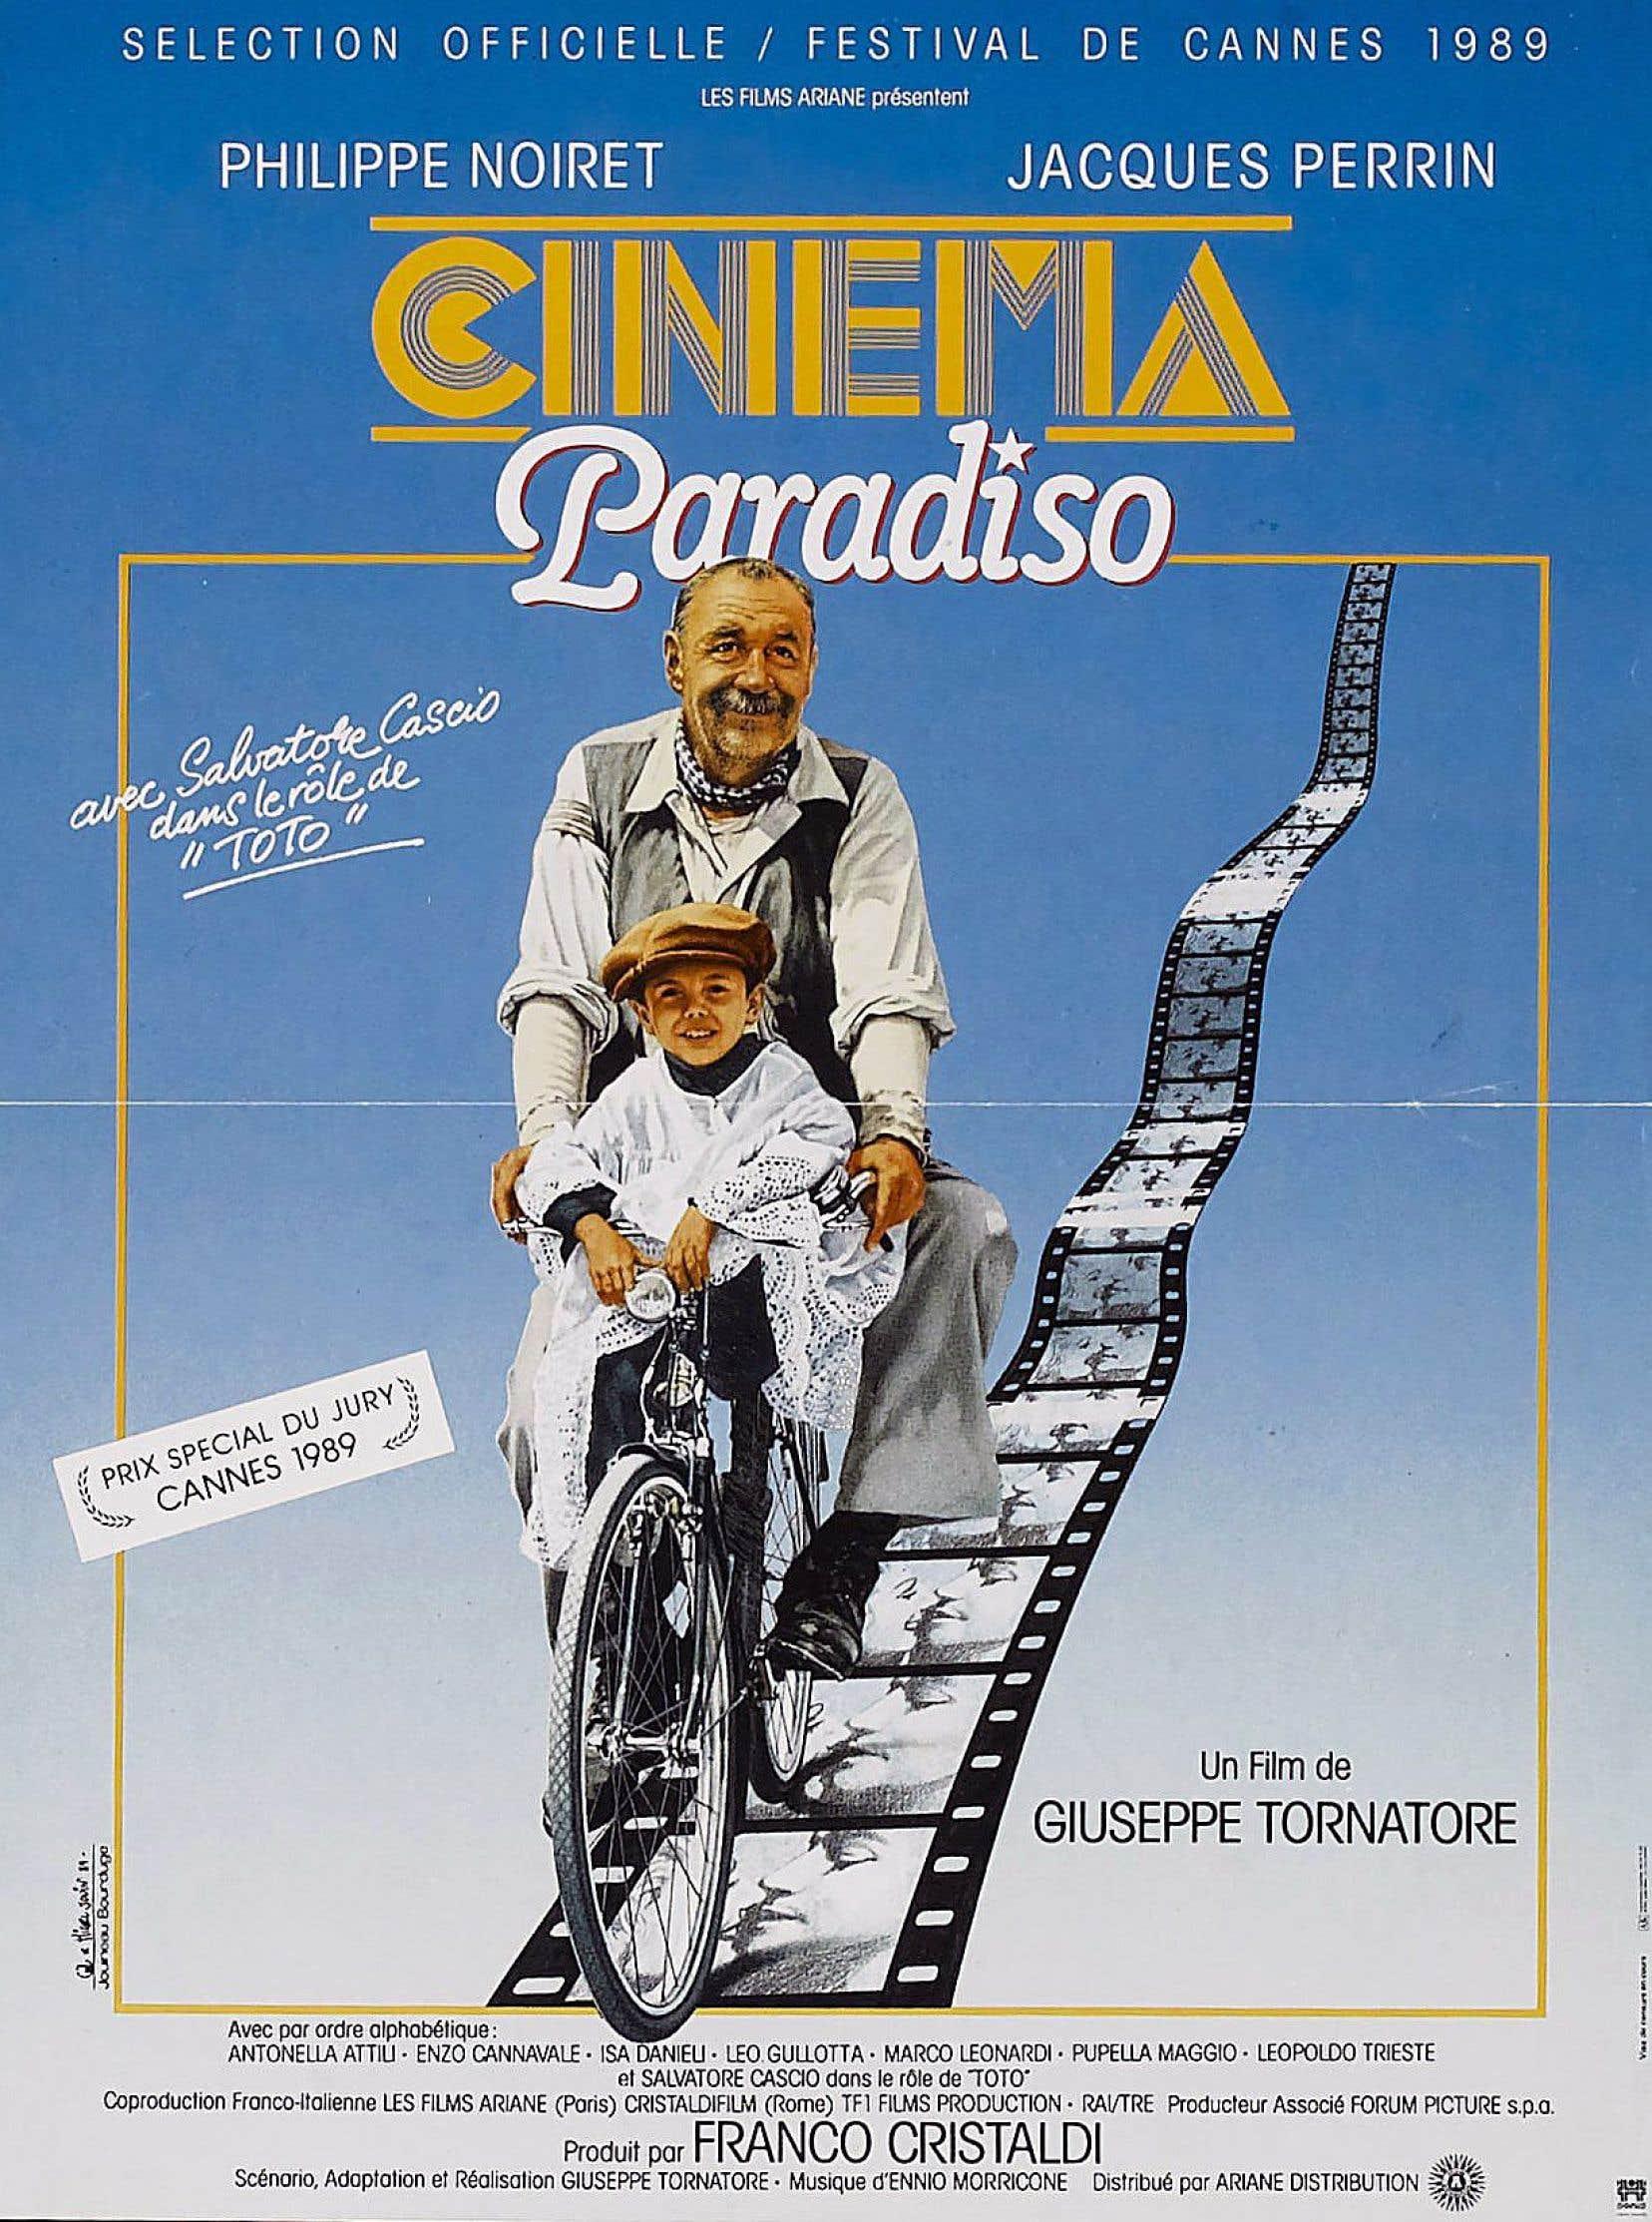 Affiche originale de «Cinema Paradiso», du réalisateur italien Giuseppe Tornatore